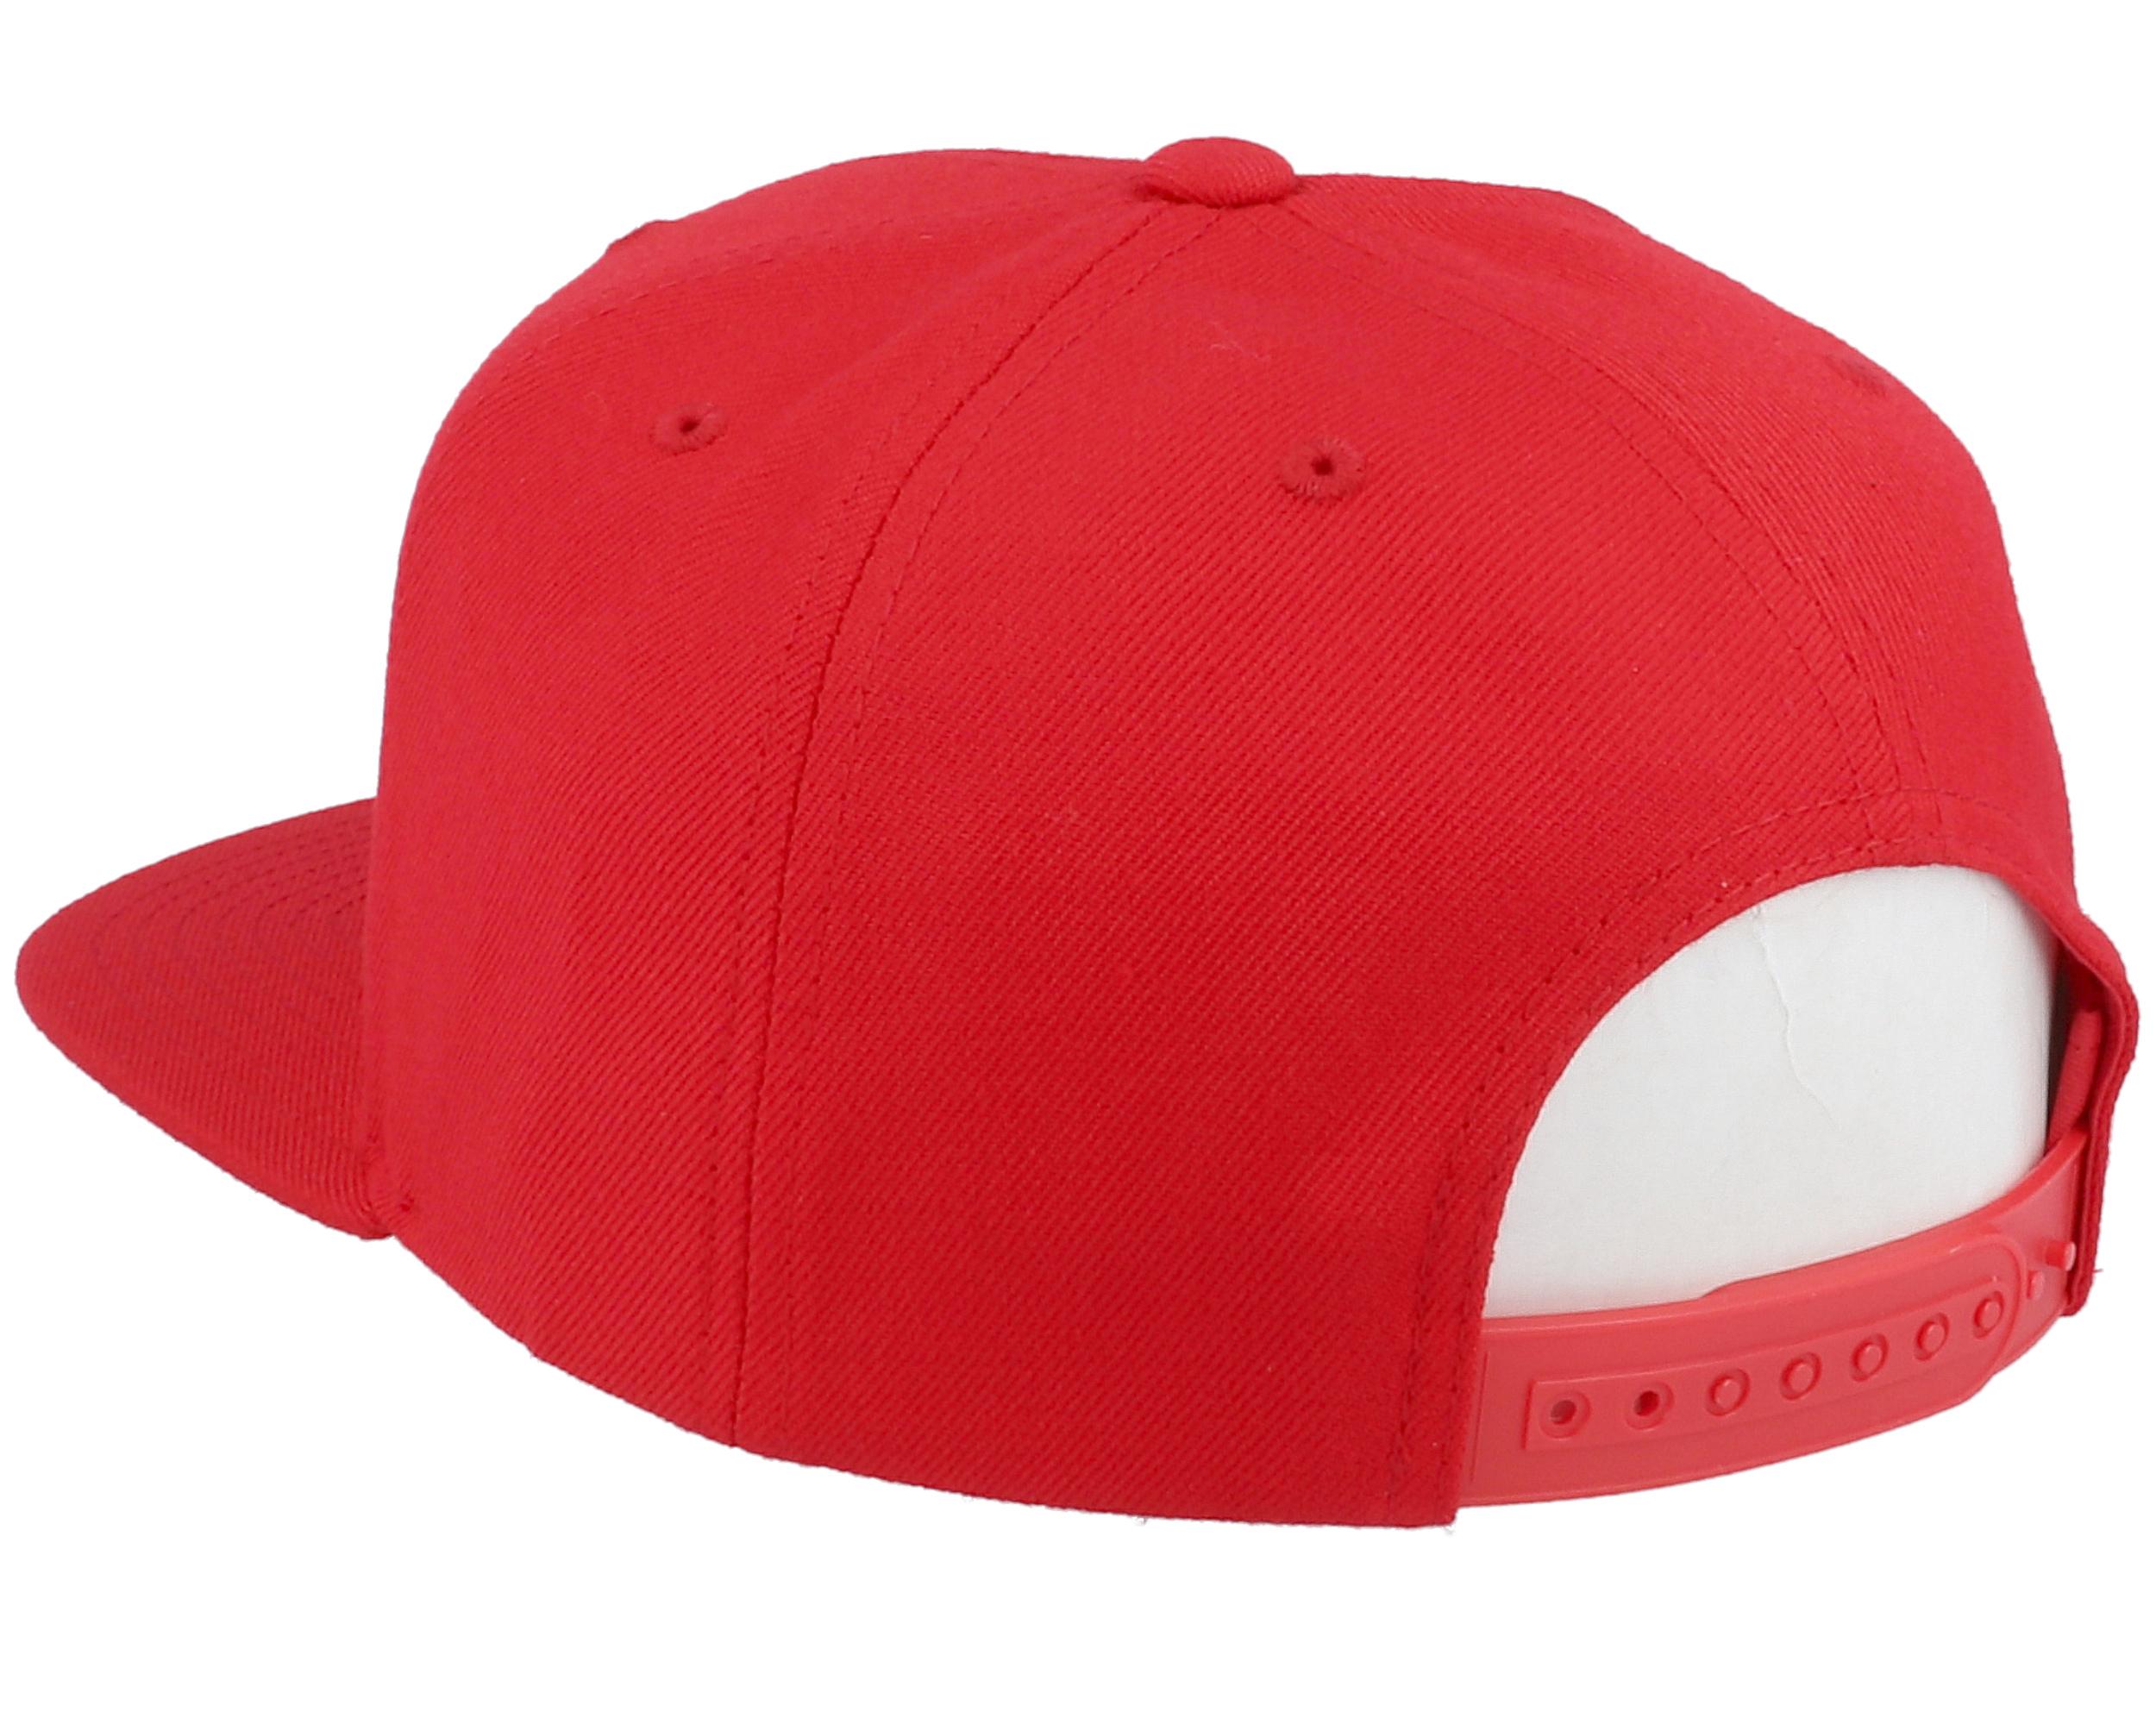 Palmer II MP Lava Red Snapback - Brixton caps